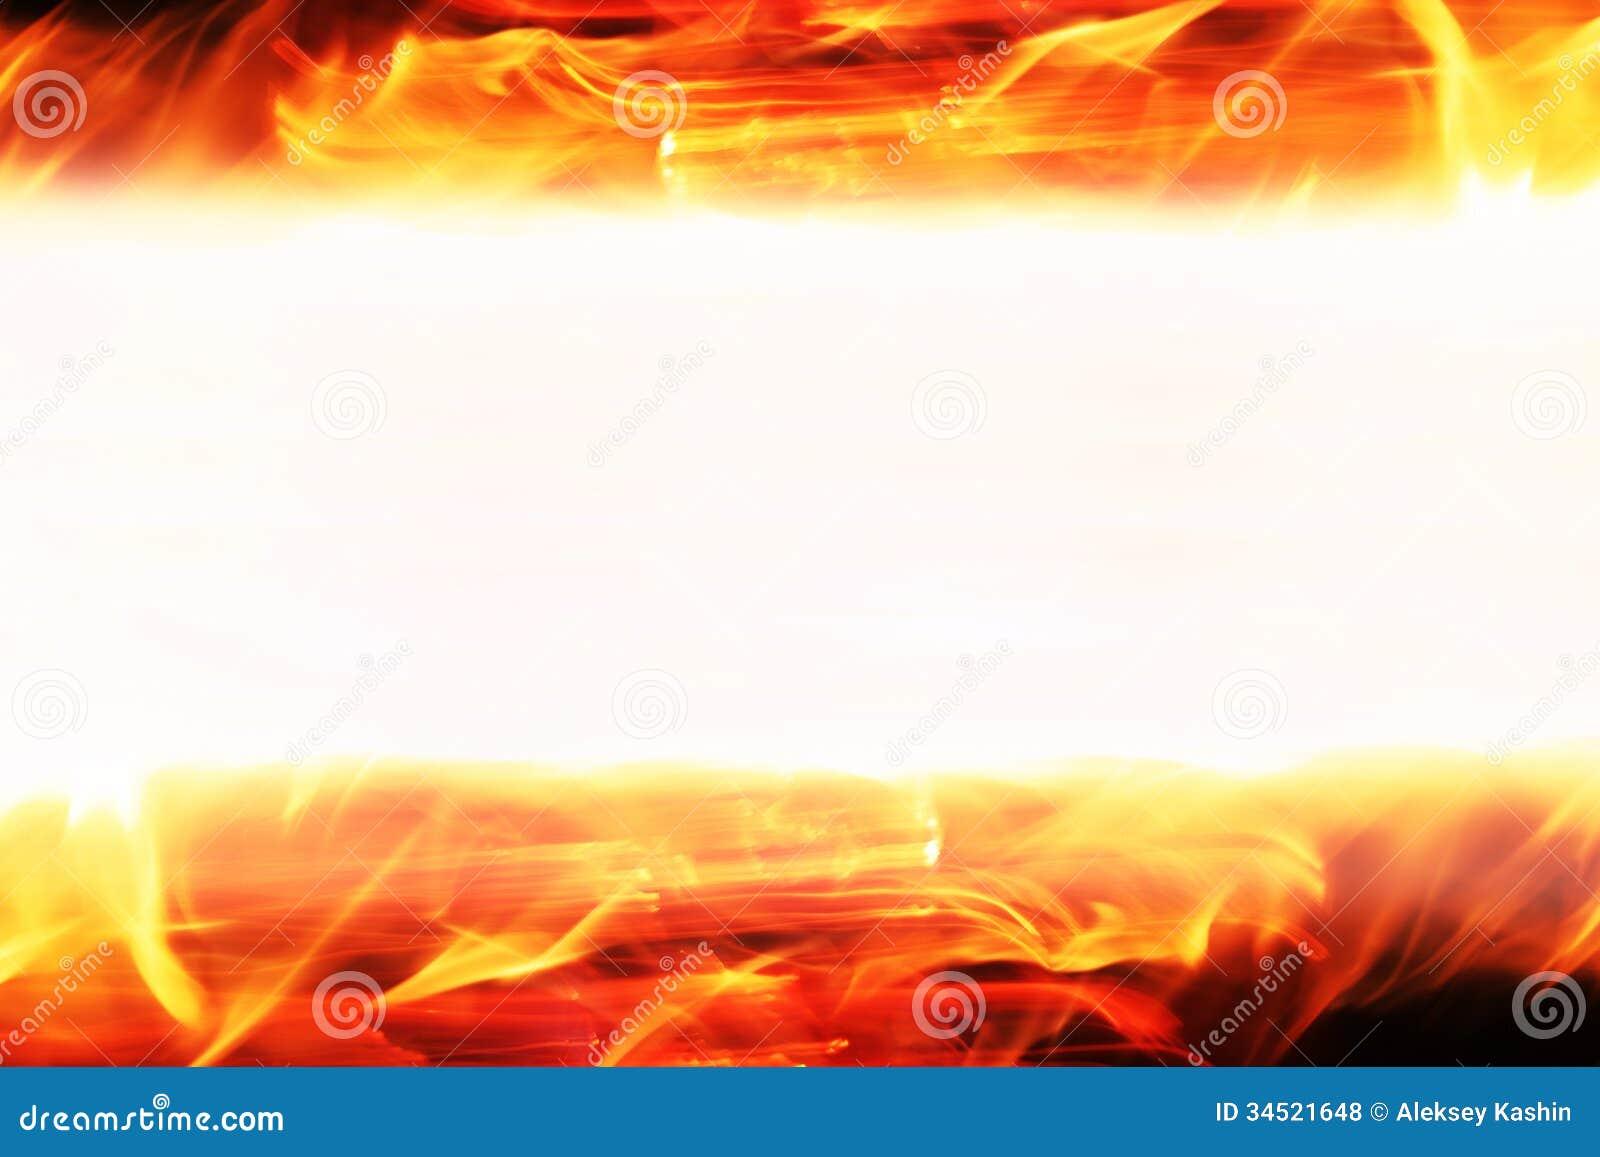 Flash fire stock illustration  Illustration of explosion